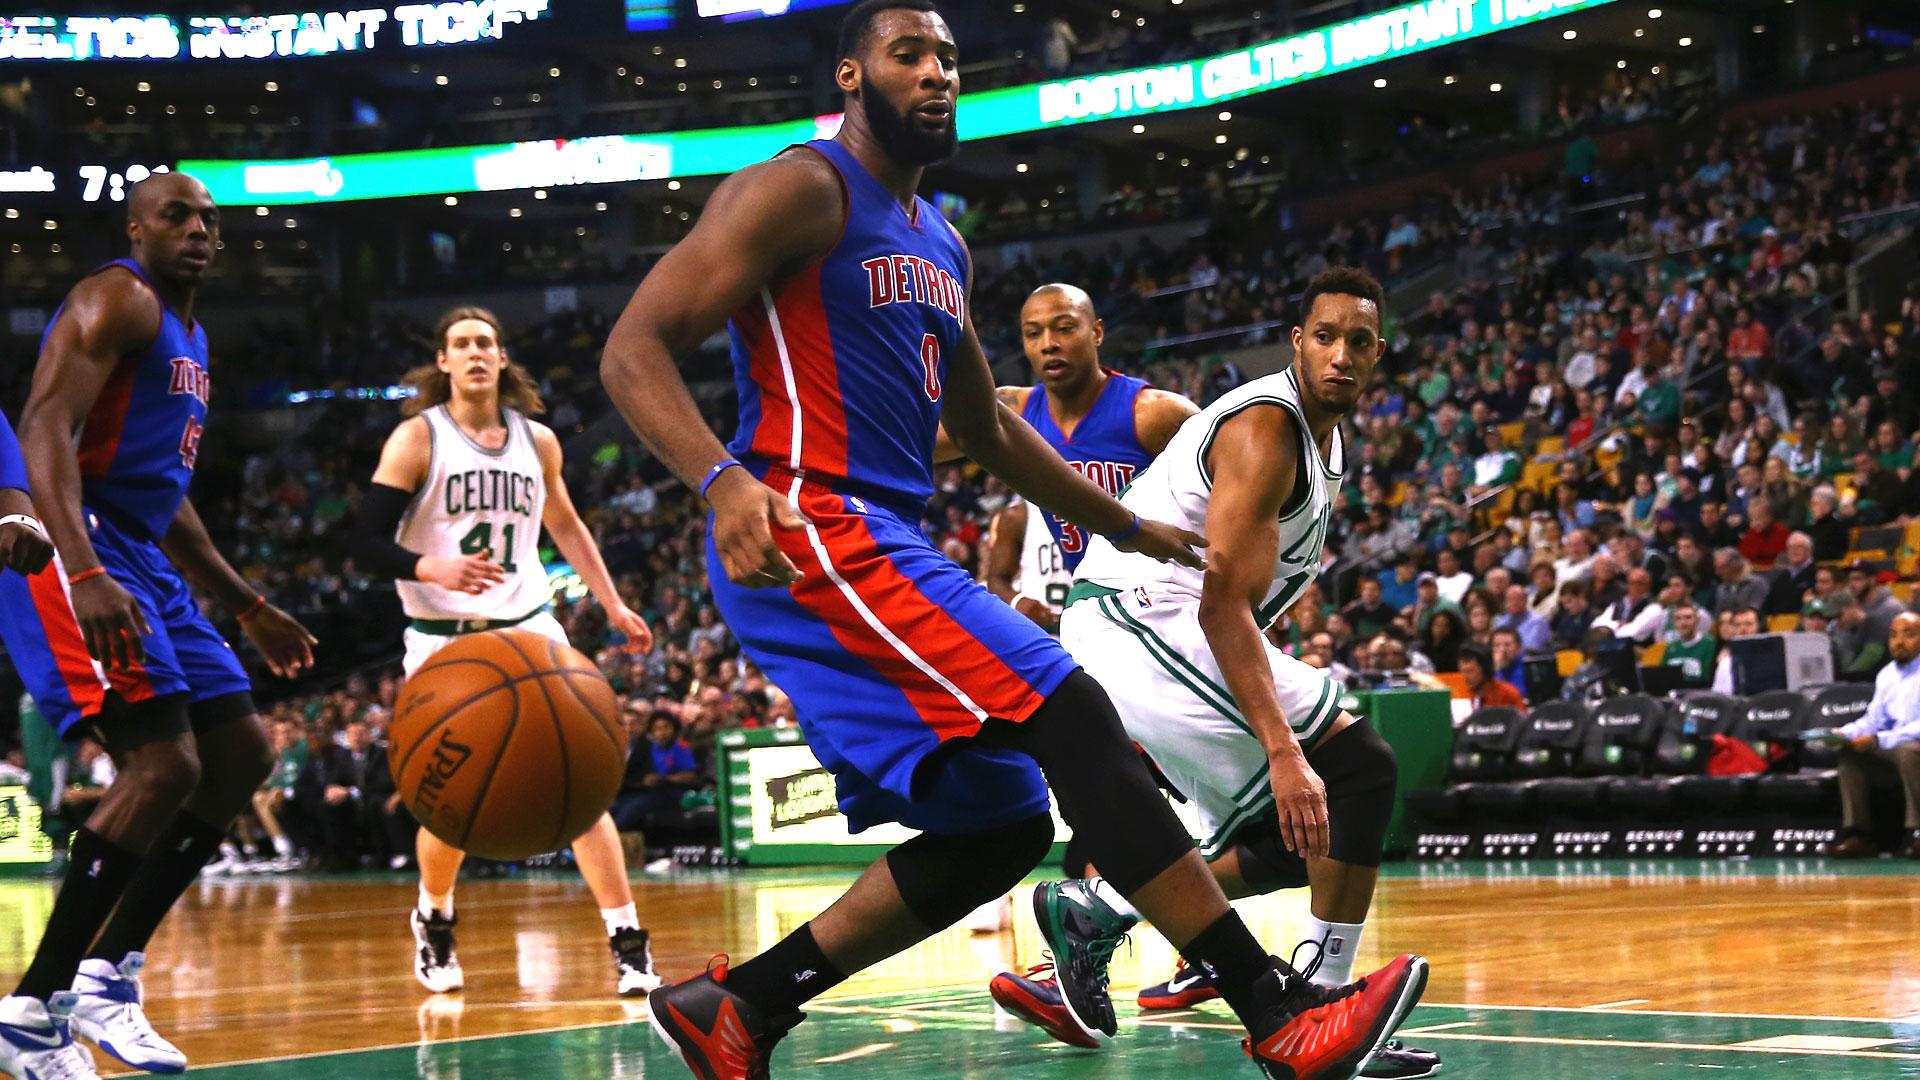 Celtics' play-off bid halted, Westbrook posts 10th triple-double